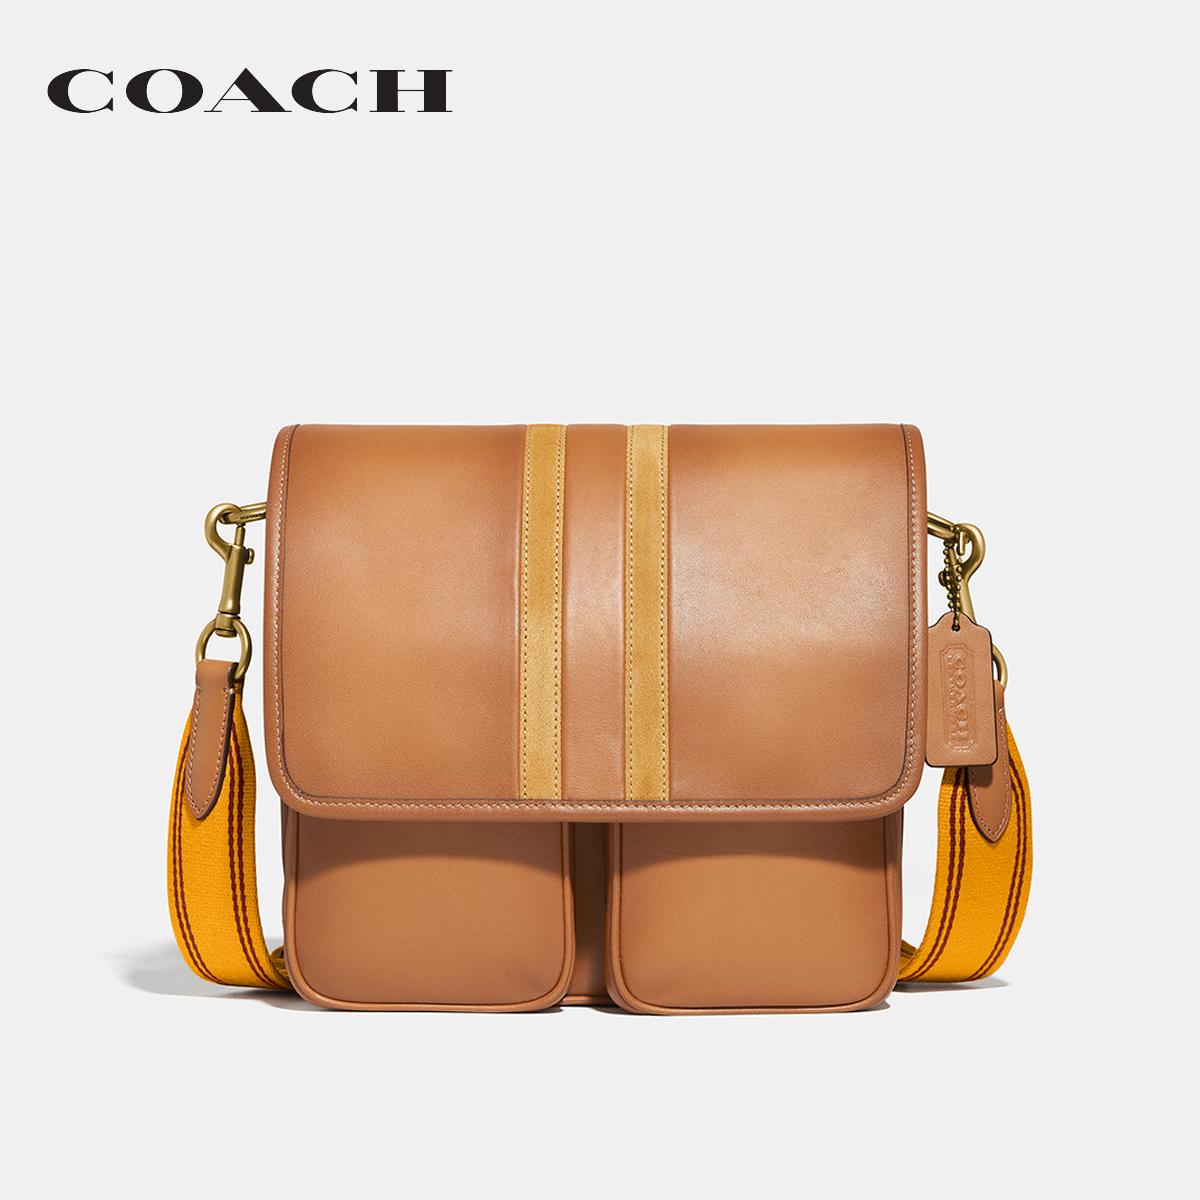 COACH Map Bag With Varsity Stripe CO3681 OLRBA กระเป๋าสะพายข้าง